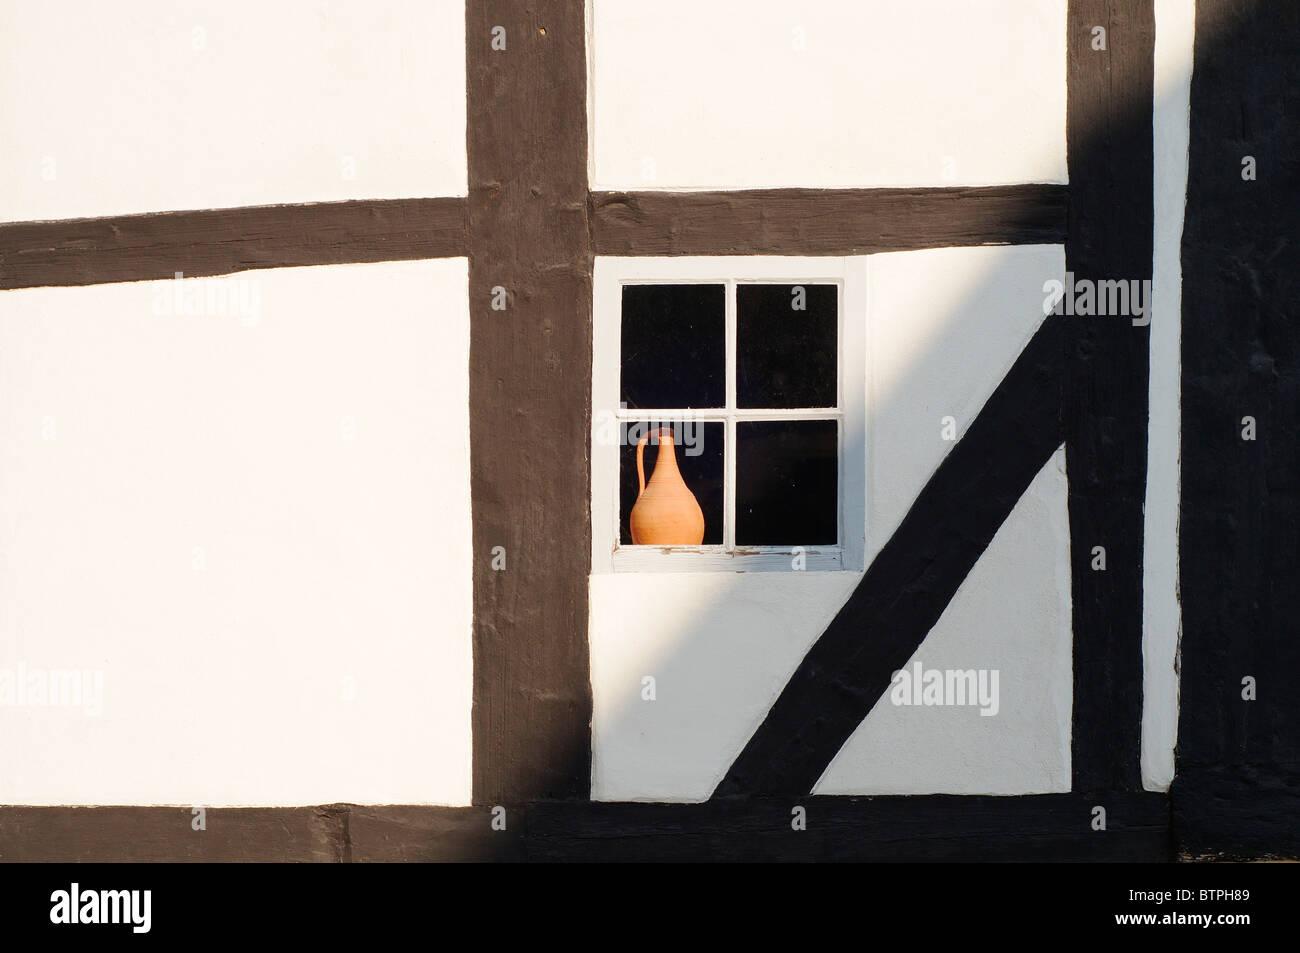 Germany, Goslar, Wall and window - Stock Image